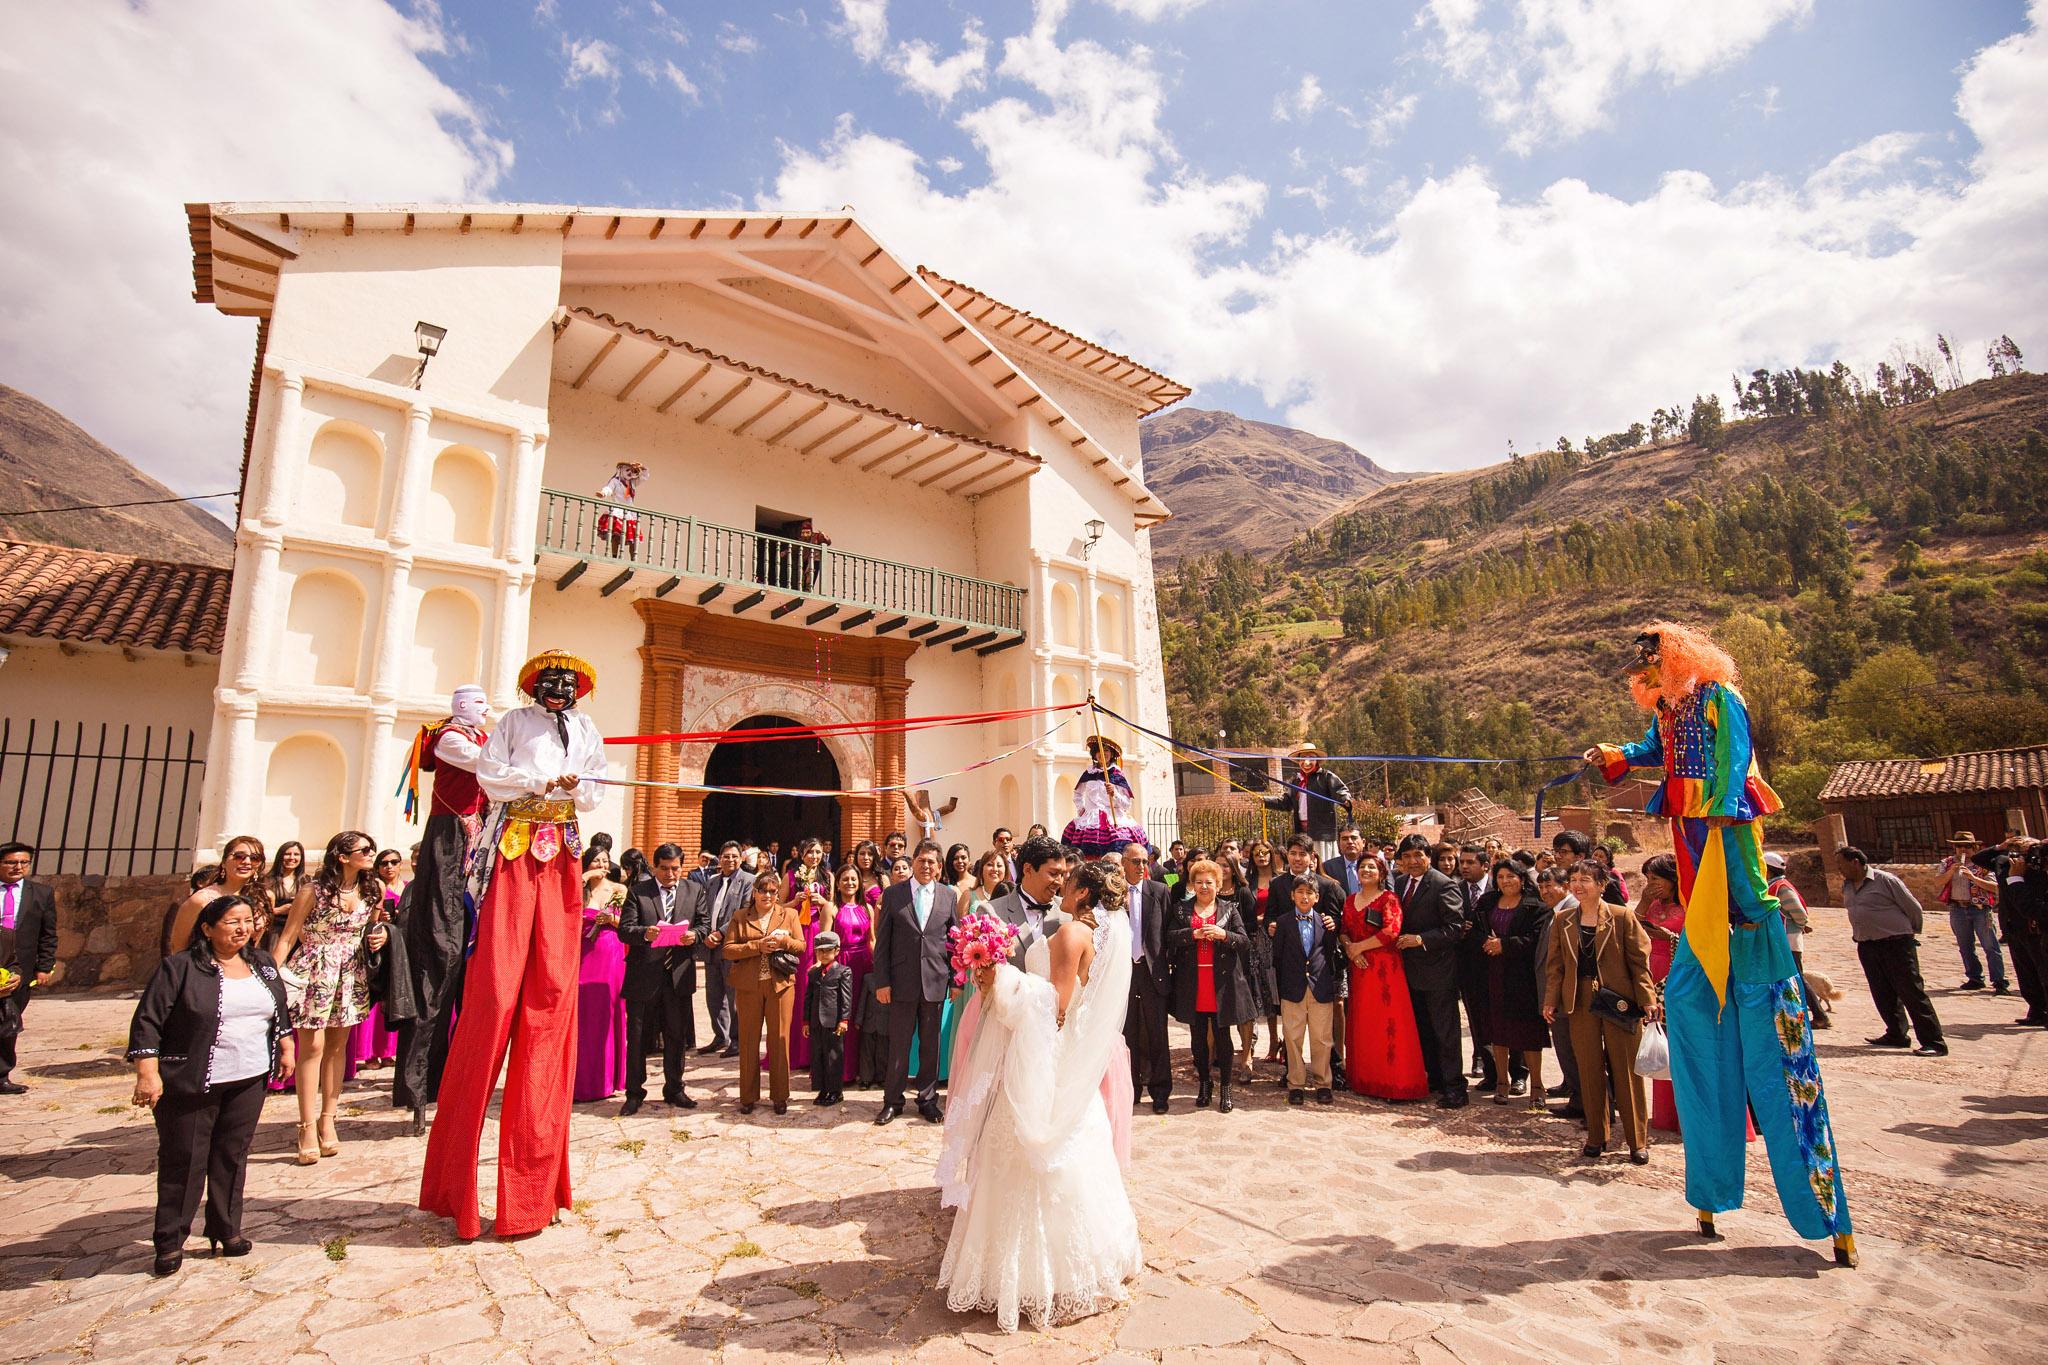 Wedding-Travellers-Destination-Wedding-Peru-Cusco-Hacienda-Sarapampa-Sacred-Valley-tradition